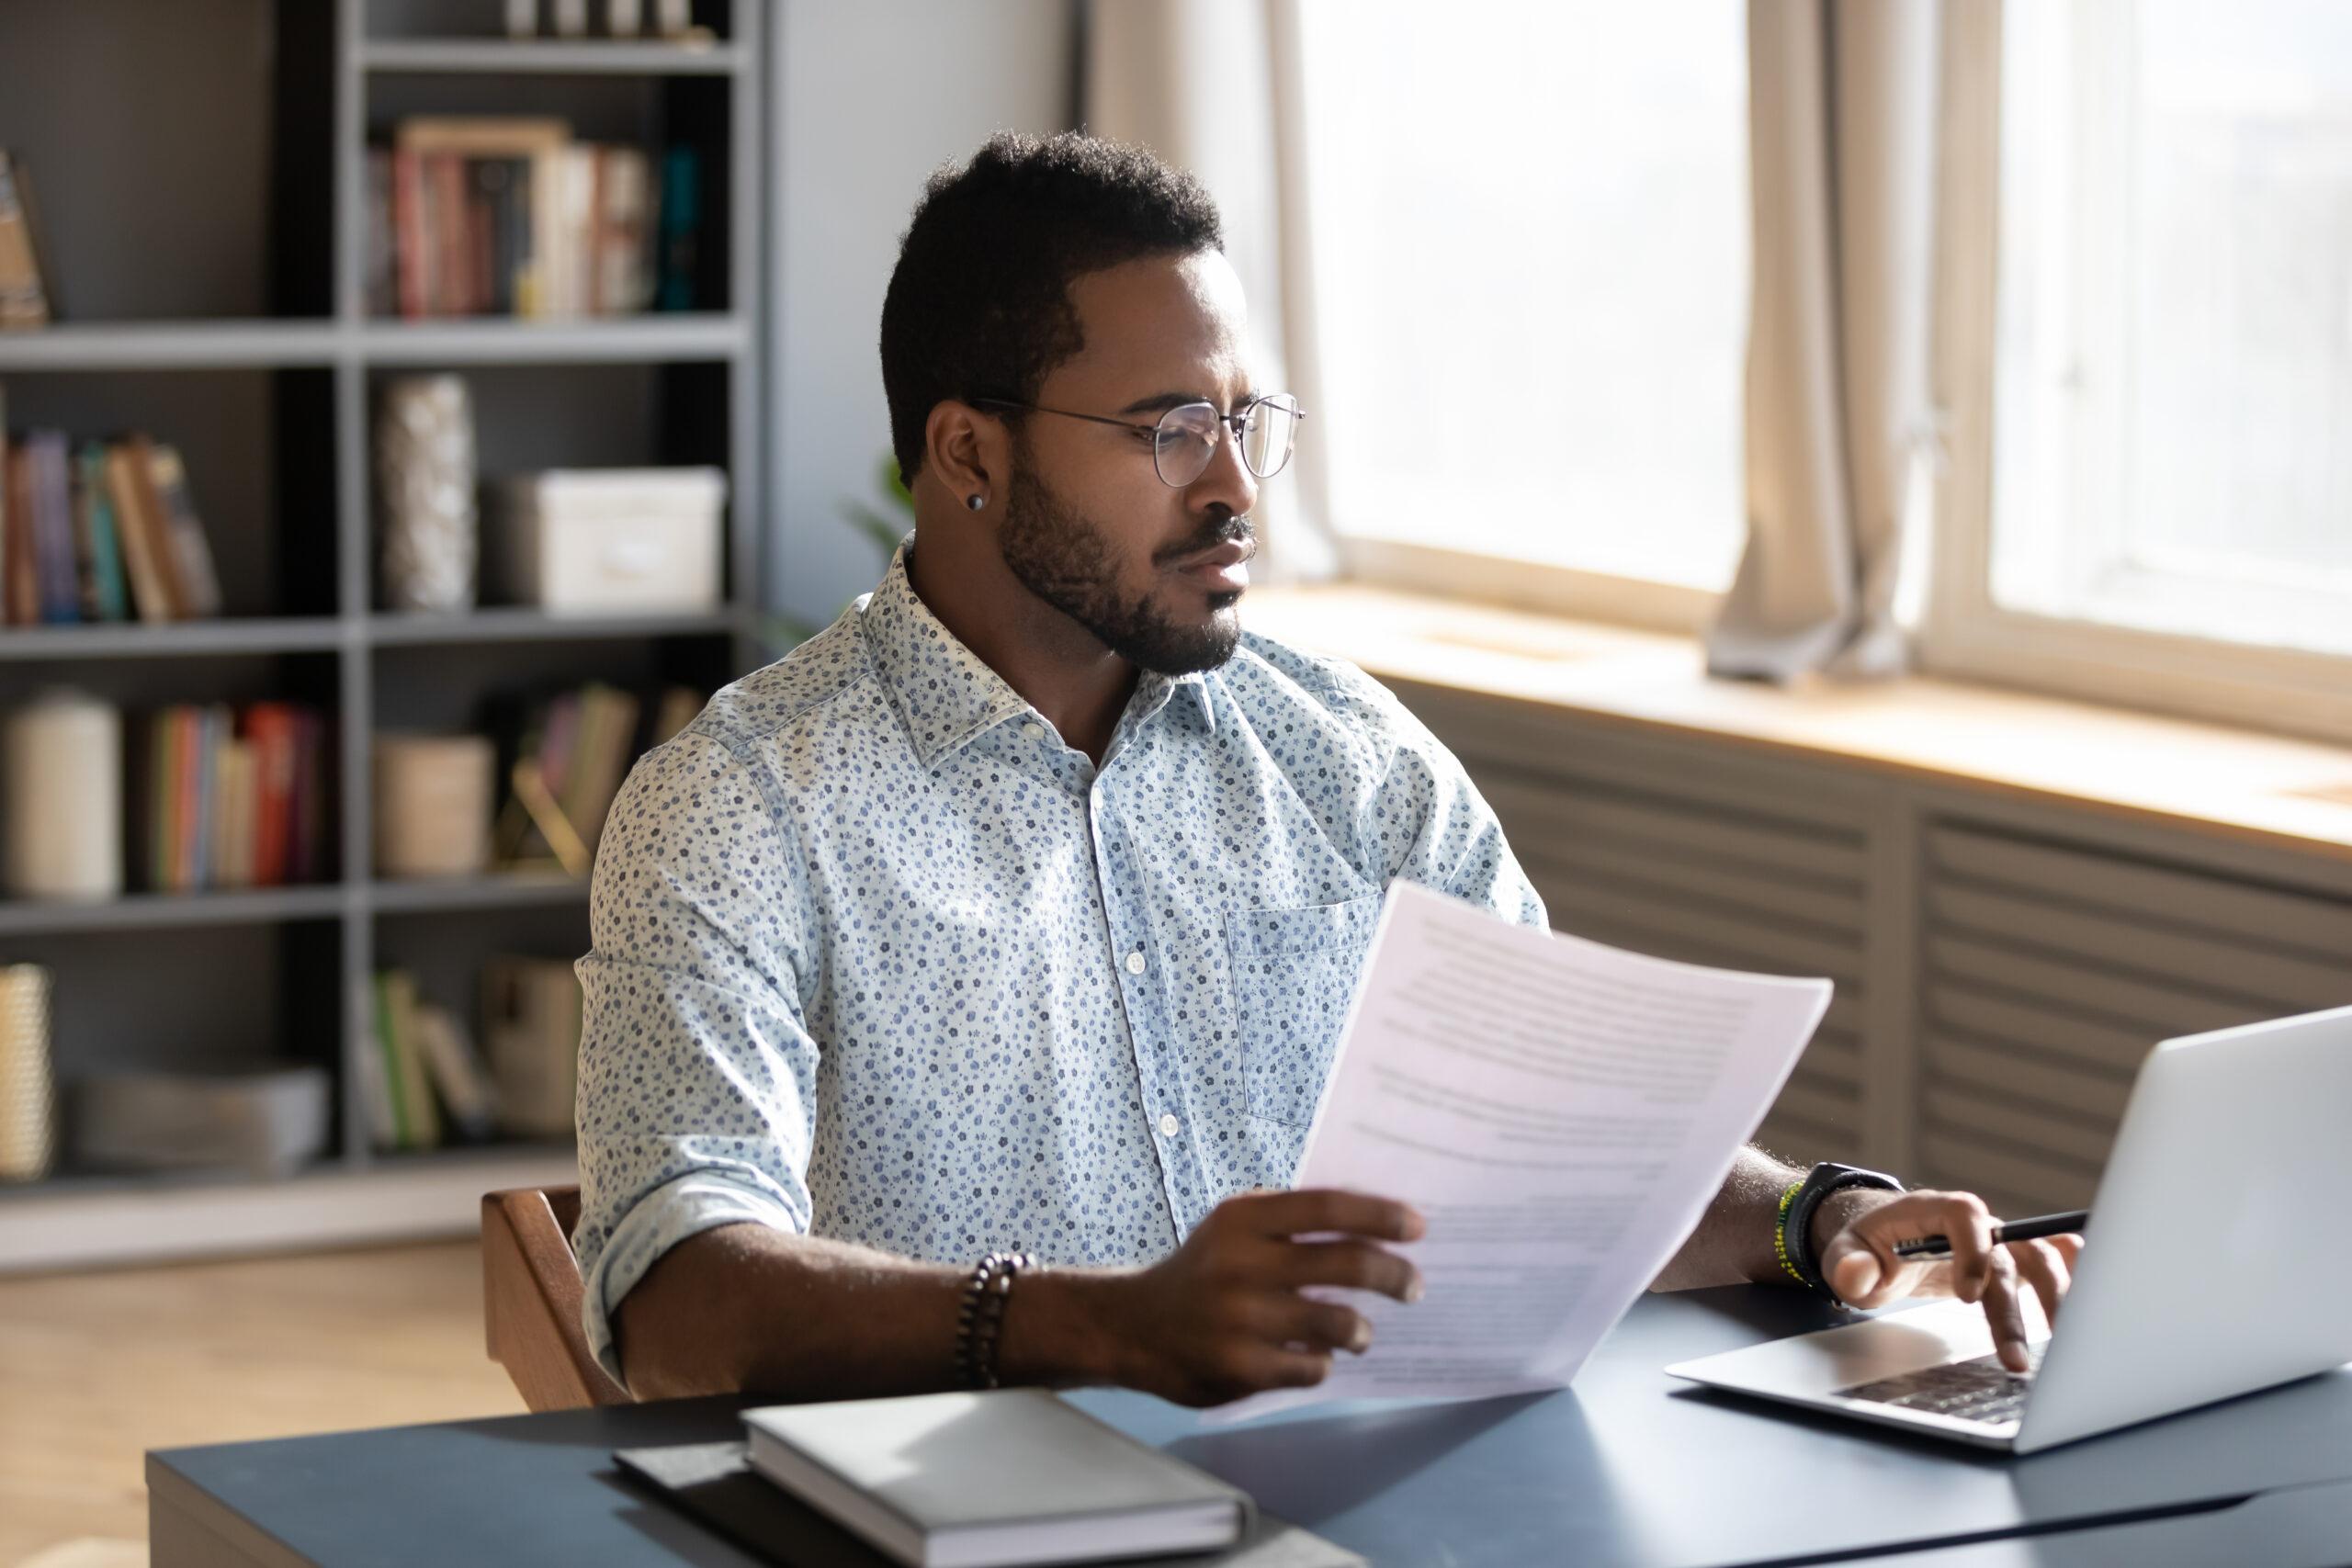 Man reviewing his resume